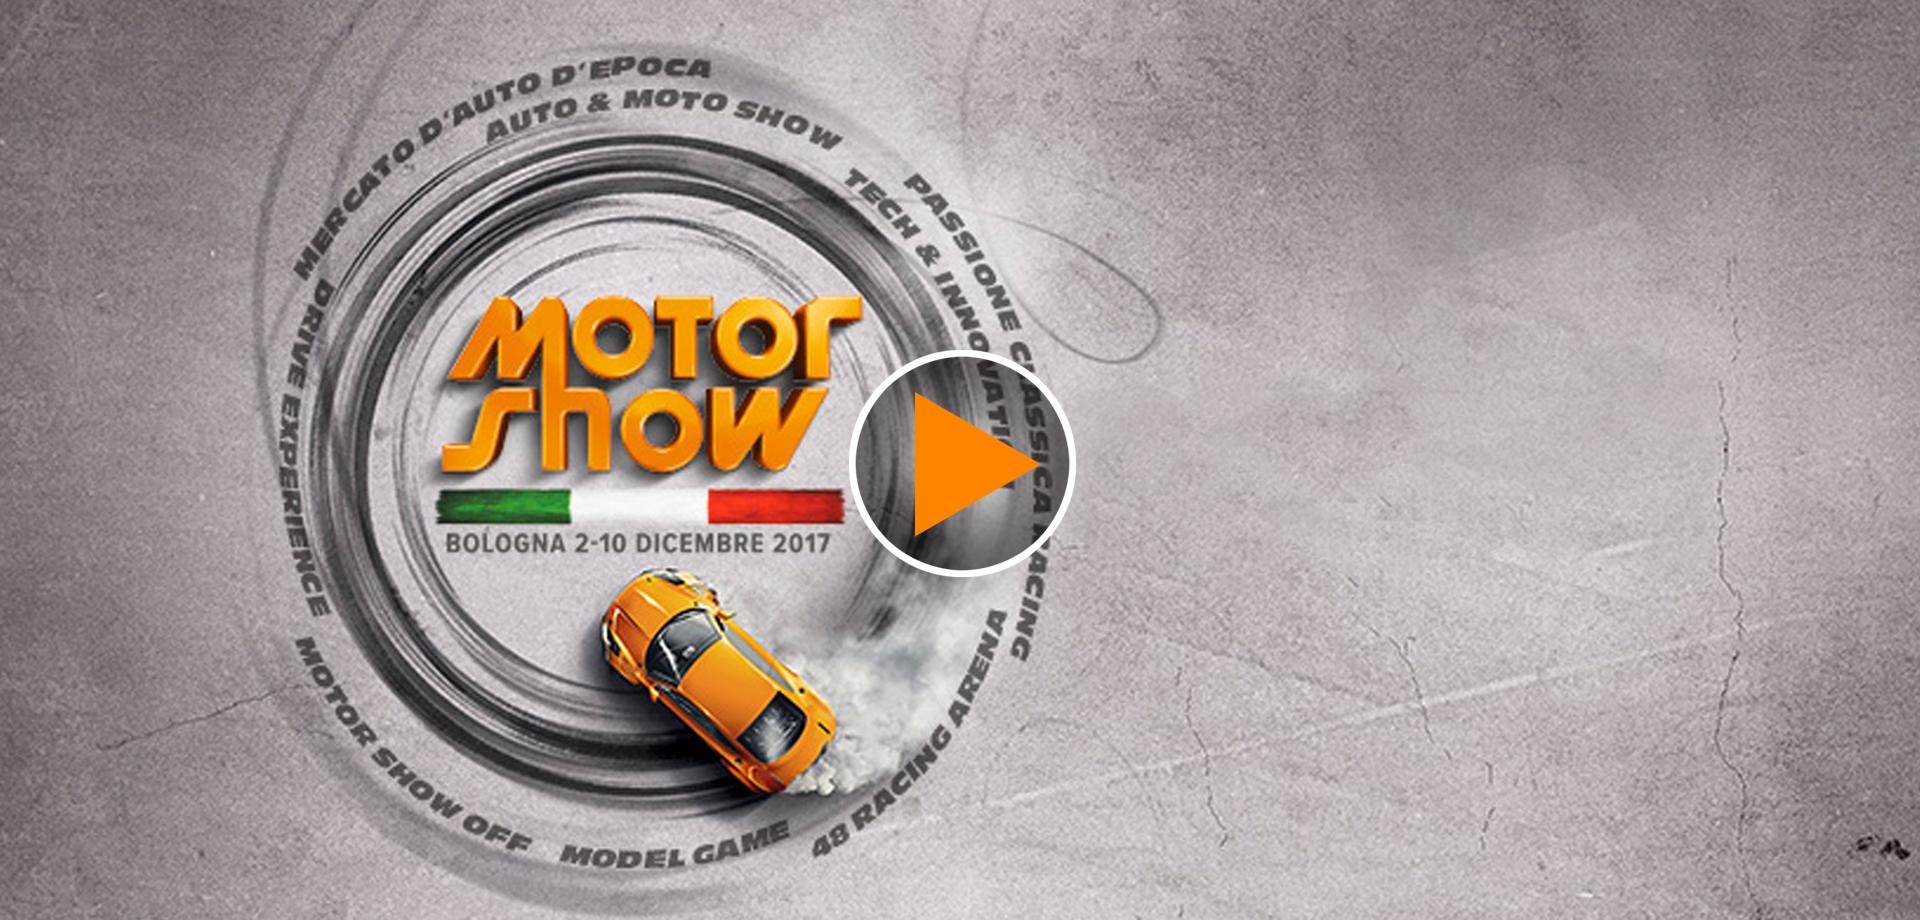 Speciale Motorshow 2017